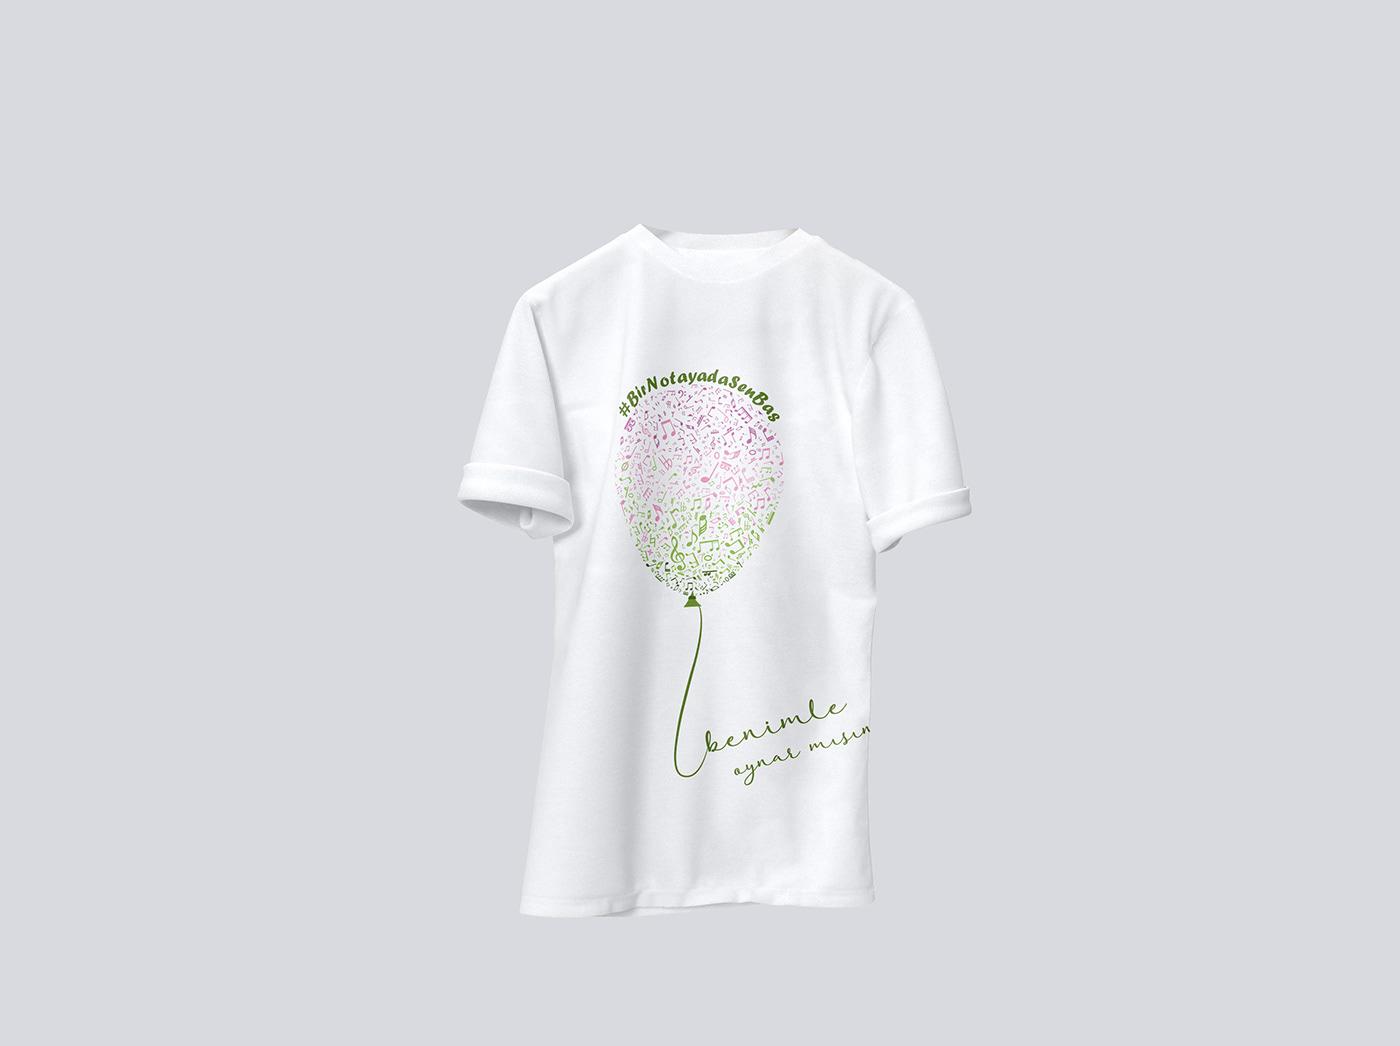 T-Shirt Design t-shirt Fashion  tasarim ILLUSTRATION  design moda video Photography  Mockup